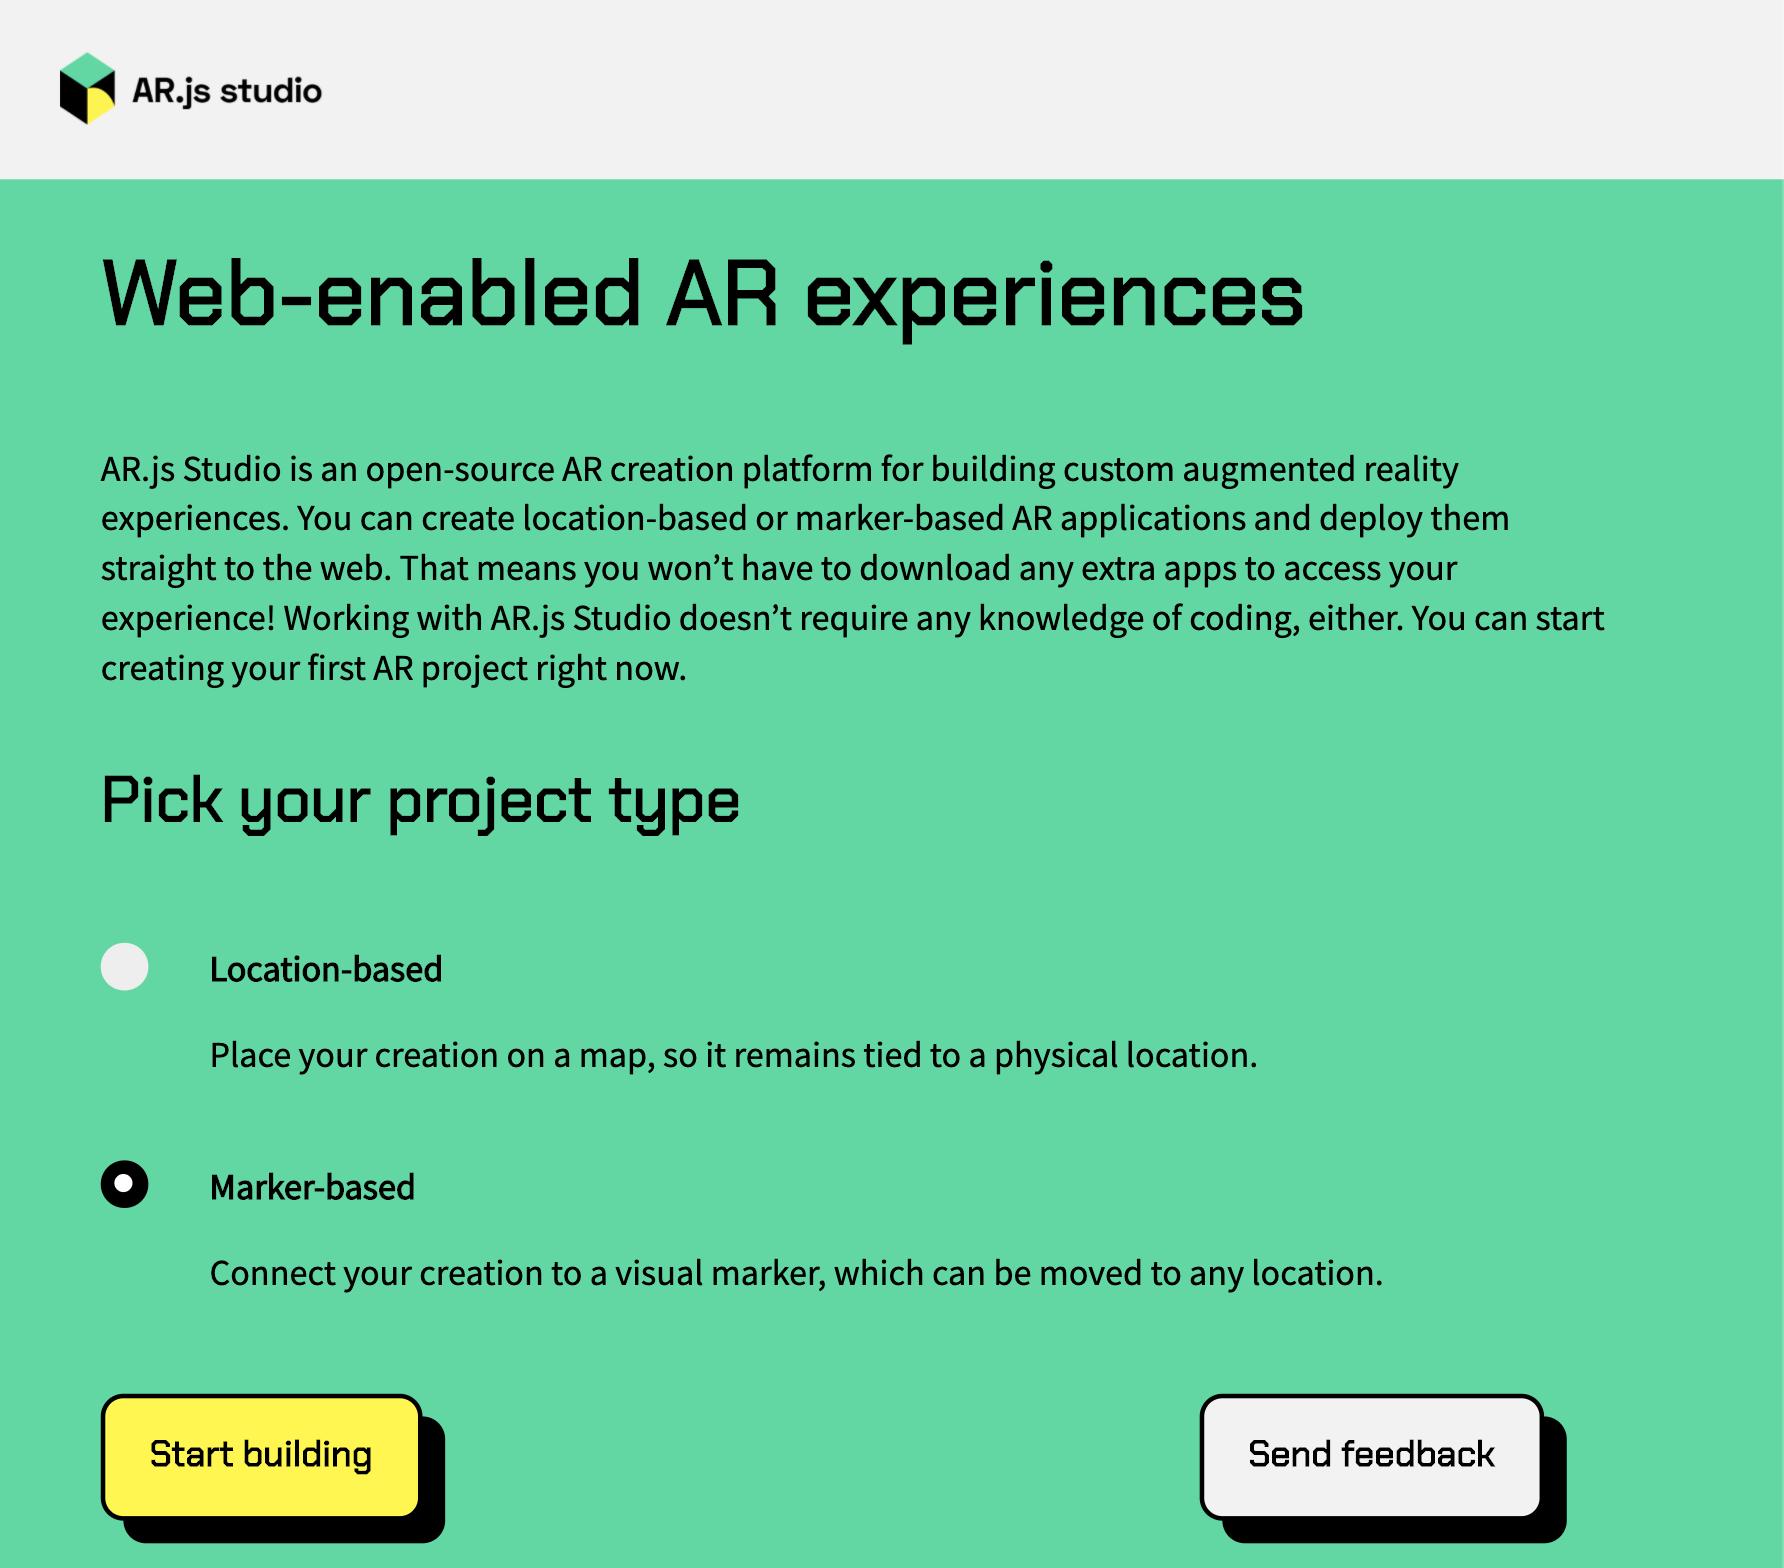 AR js Studio Marker-based